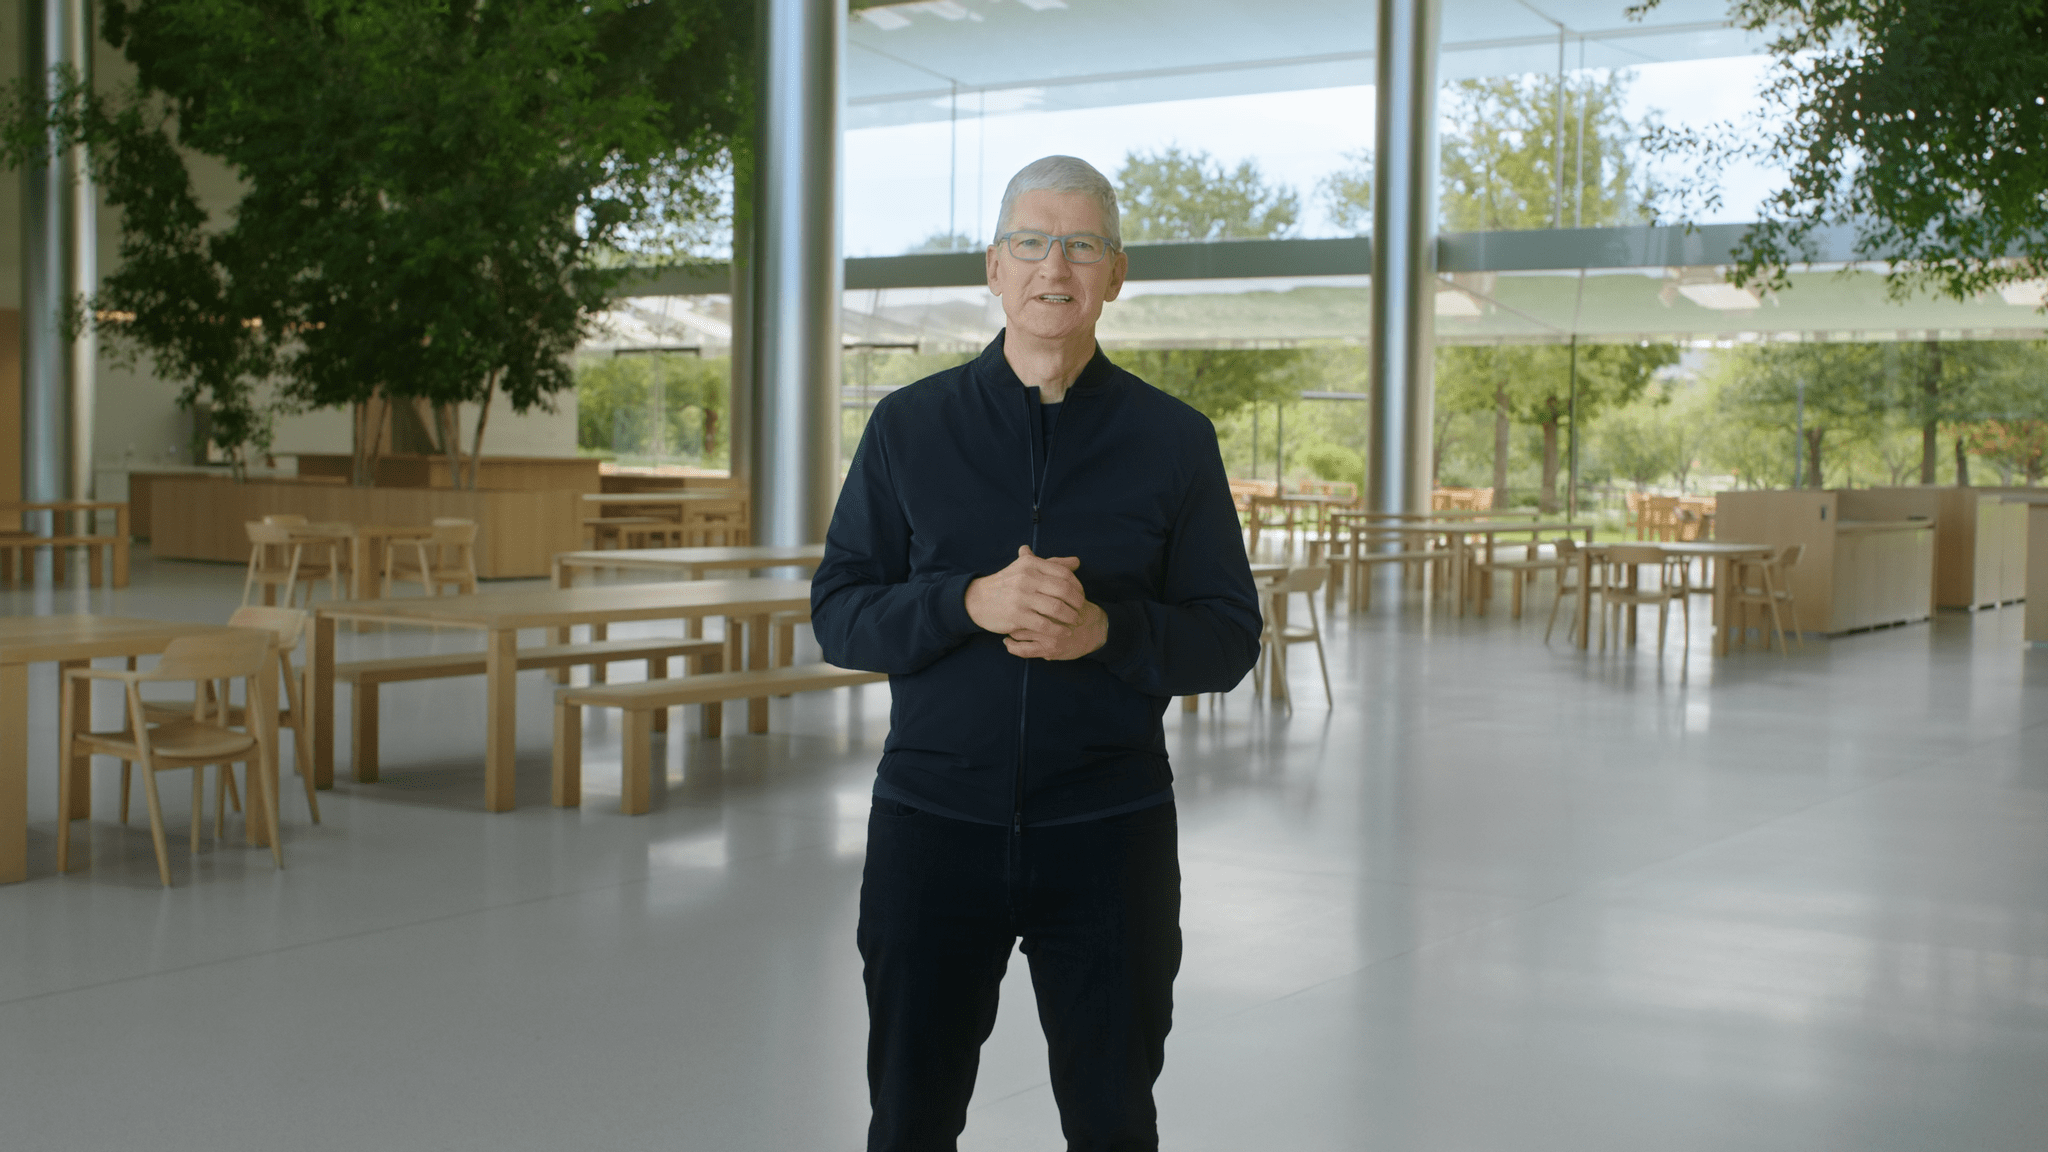 Kara Swisher Interviews Apple CEO Cook for Sway